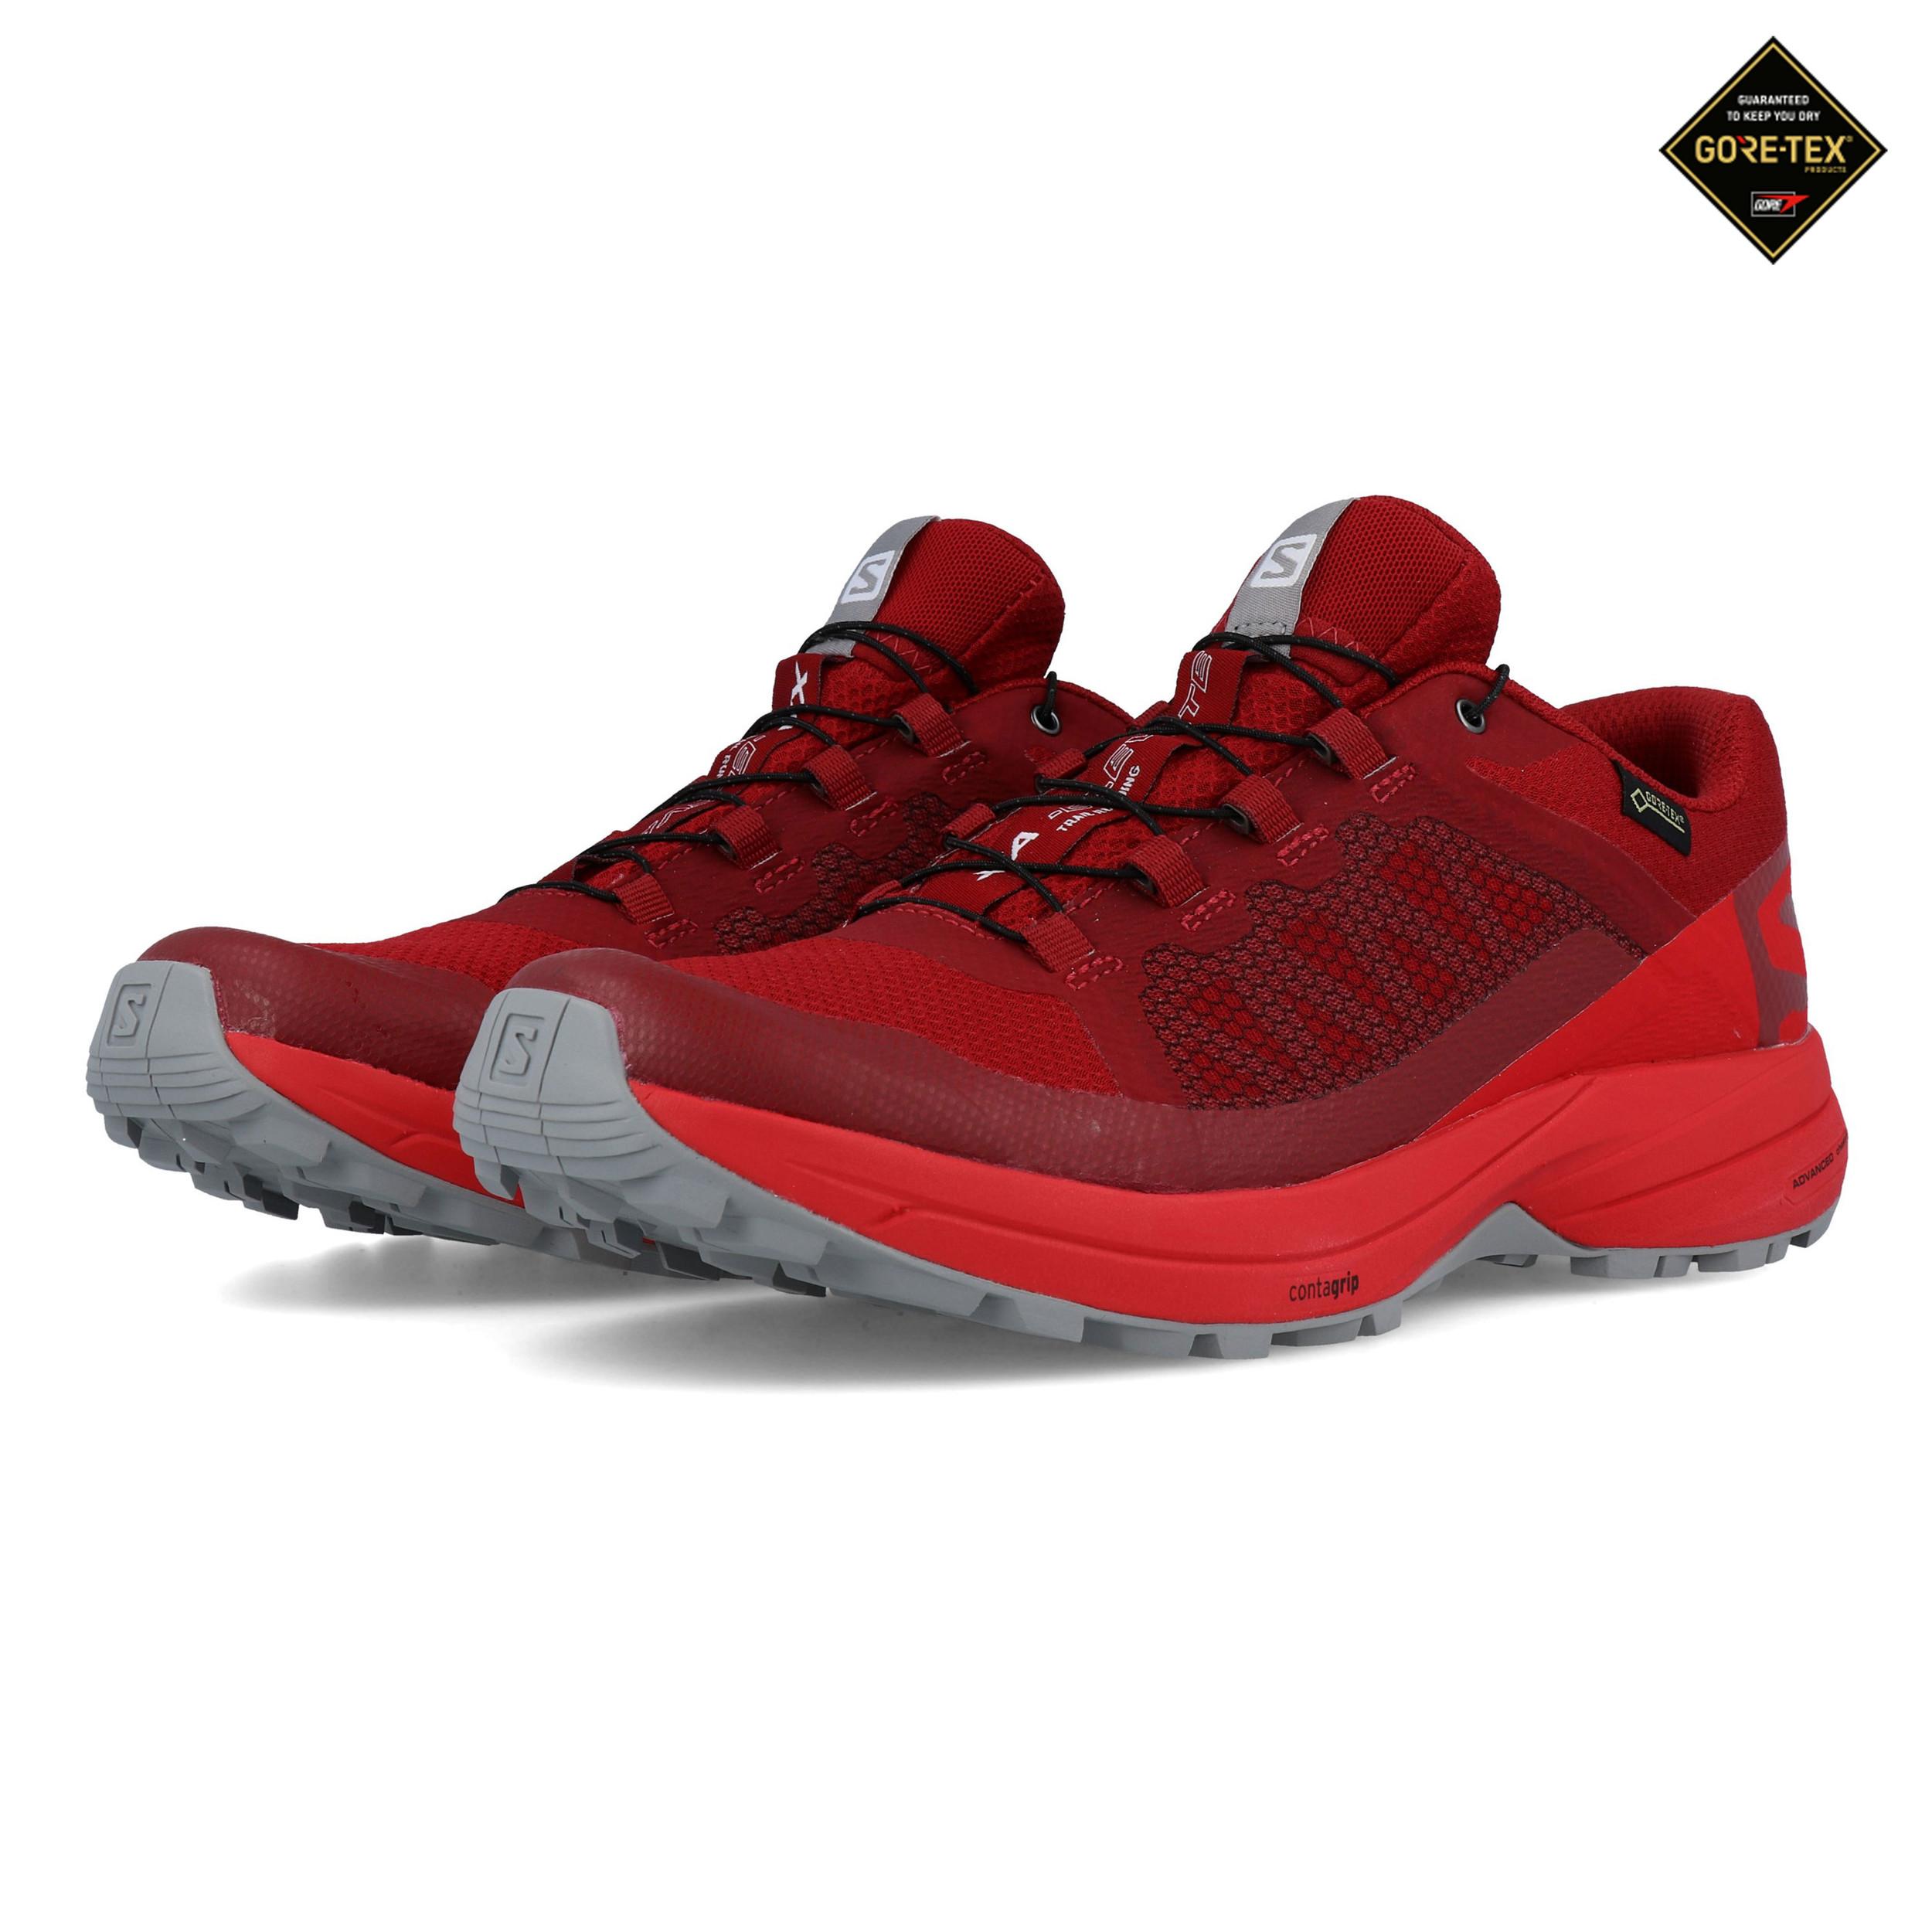 new products a2e76 b25cf Details zu Salomon Herren XA Elevate GORE TEX Trail Outdoorschuhe  Laufschuhe Sneaker Rot